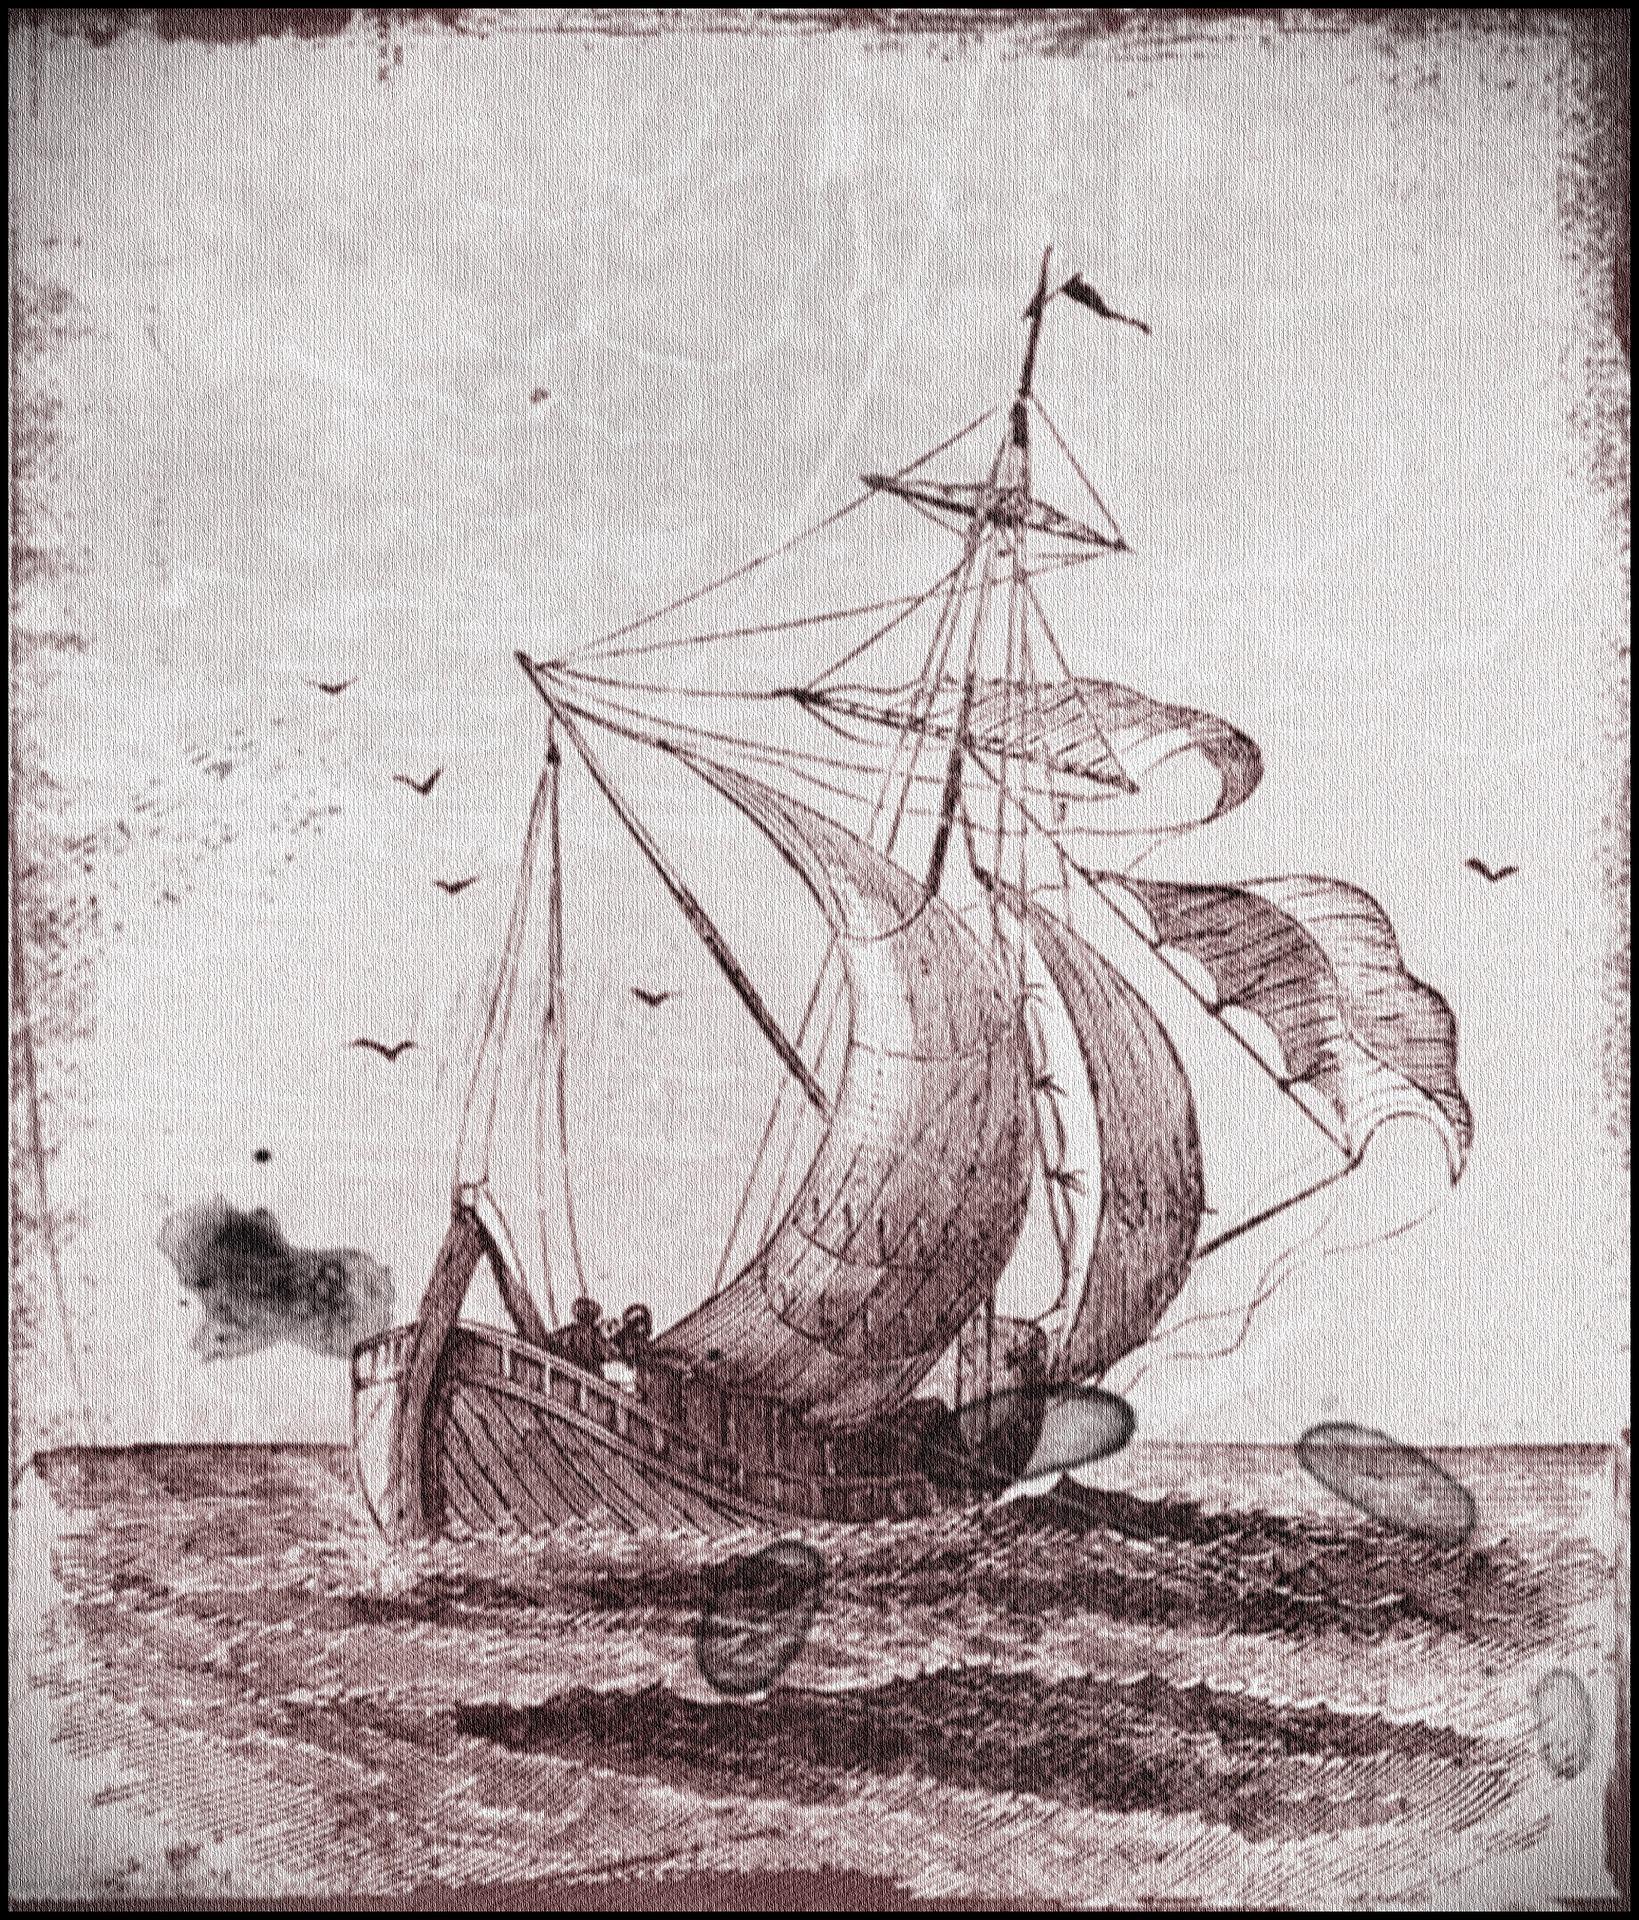 Ship Sketch, Art, Boat, Journey, Paint, HQ Photo